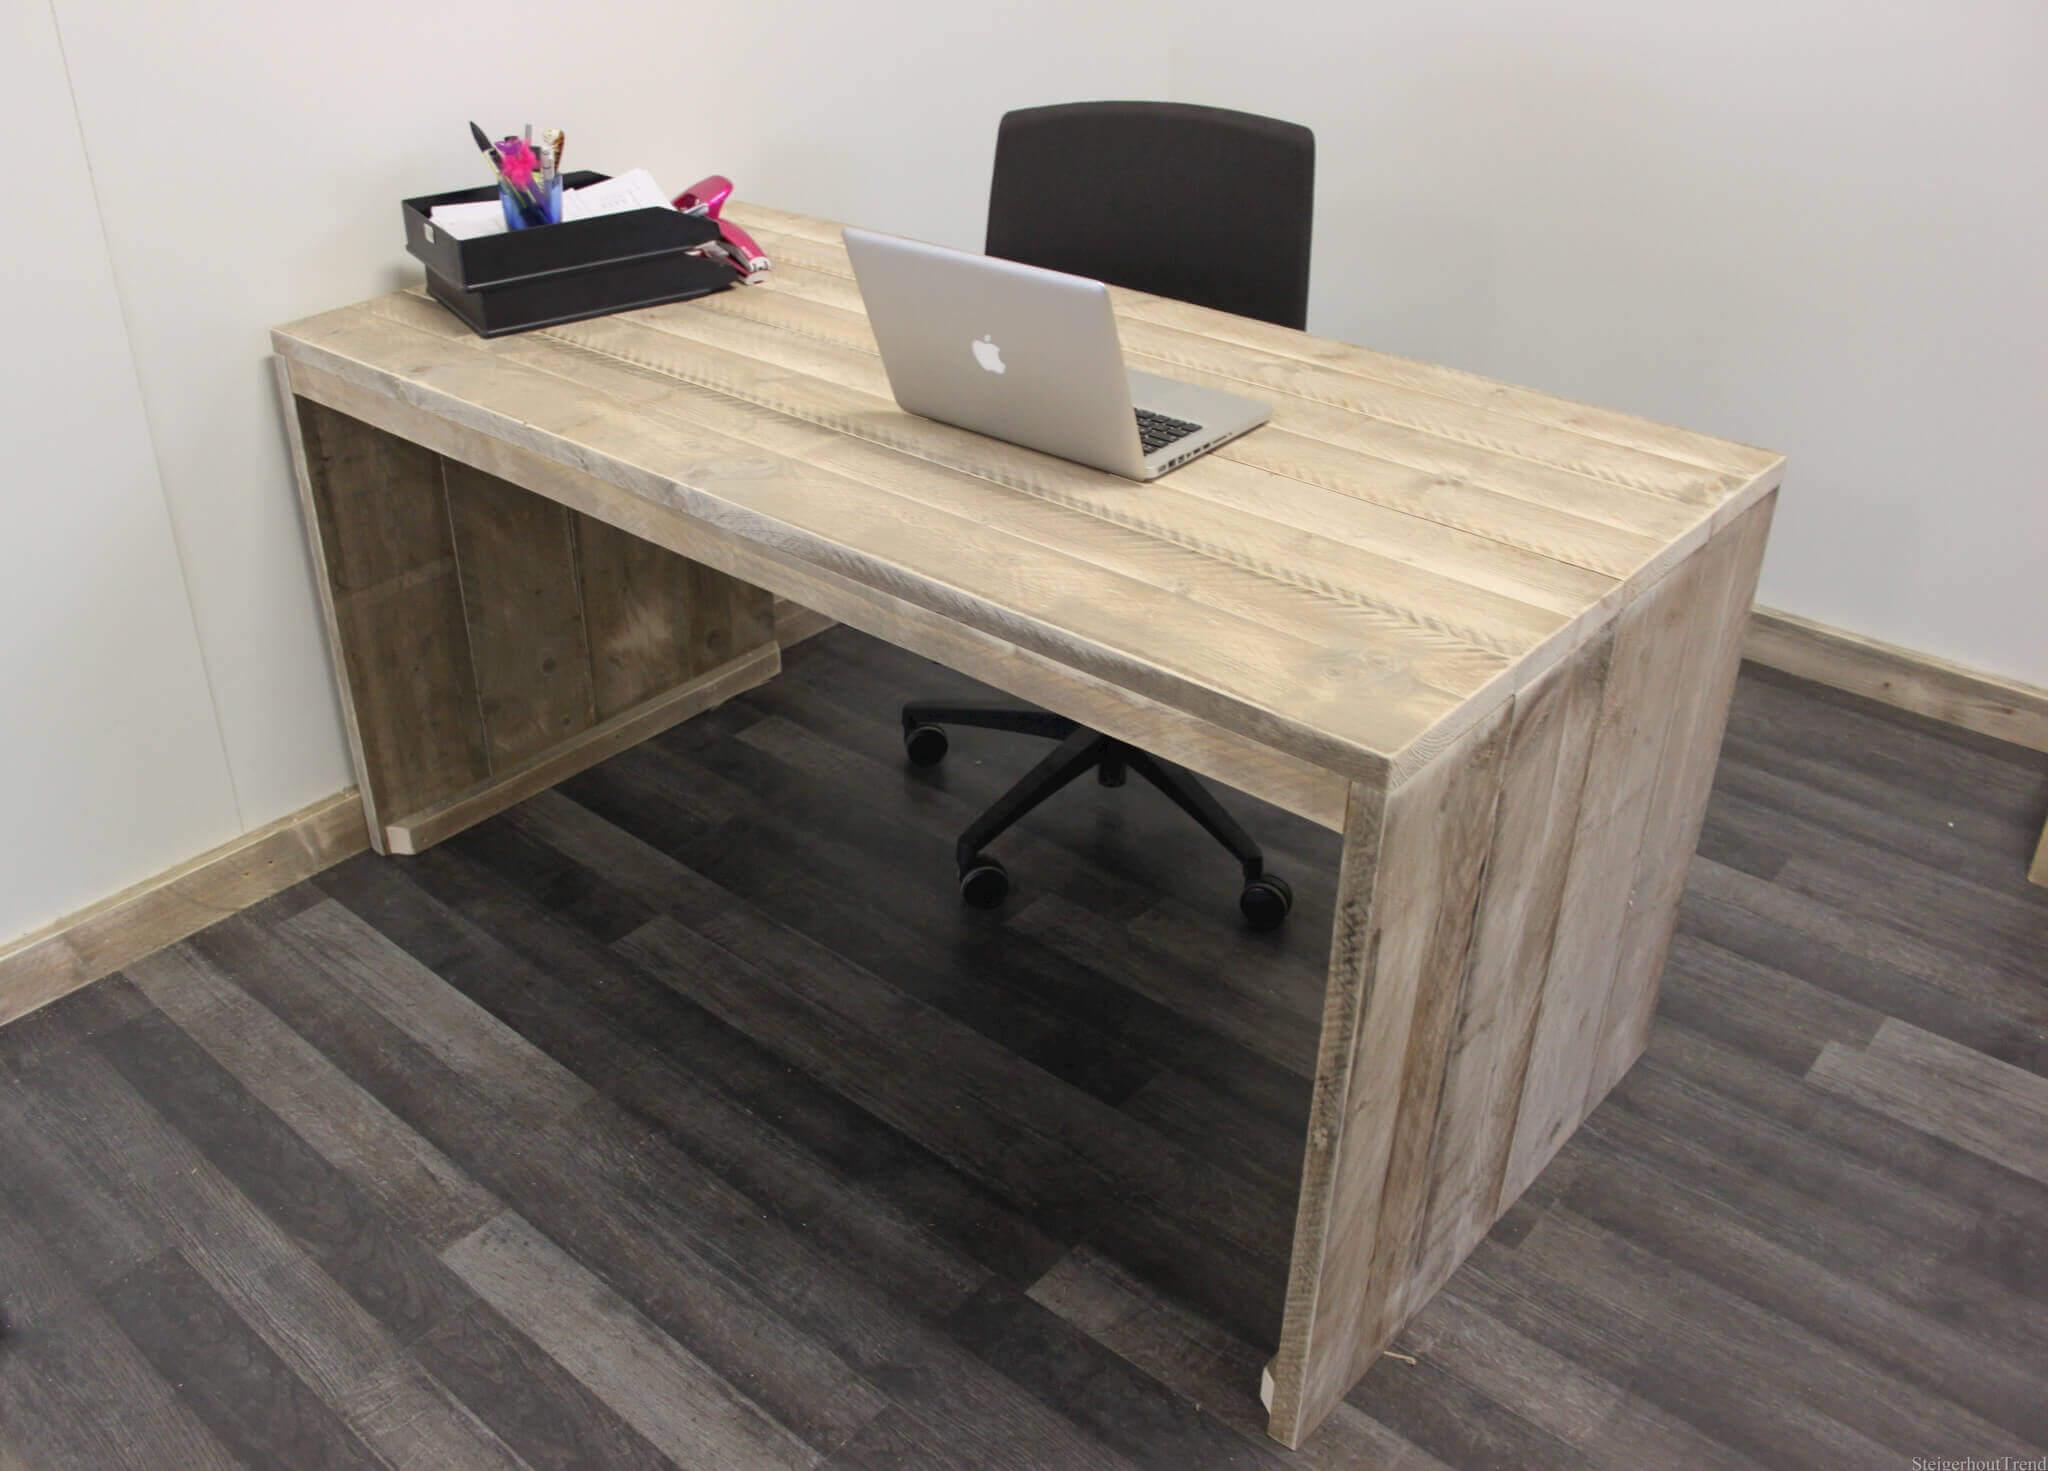 Steigerhouten bureau spencer steigerhouttrend - Eenvoudig slaapkamer model ...